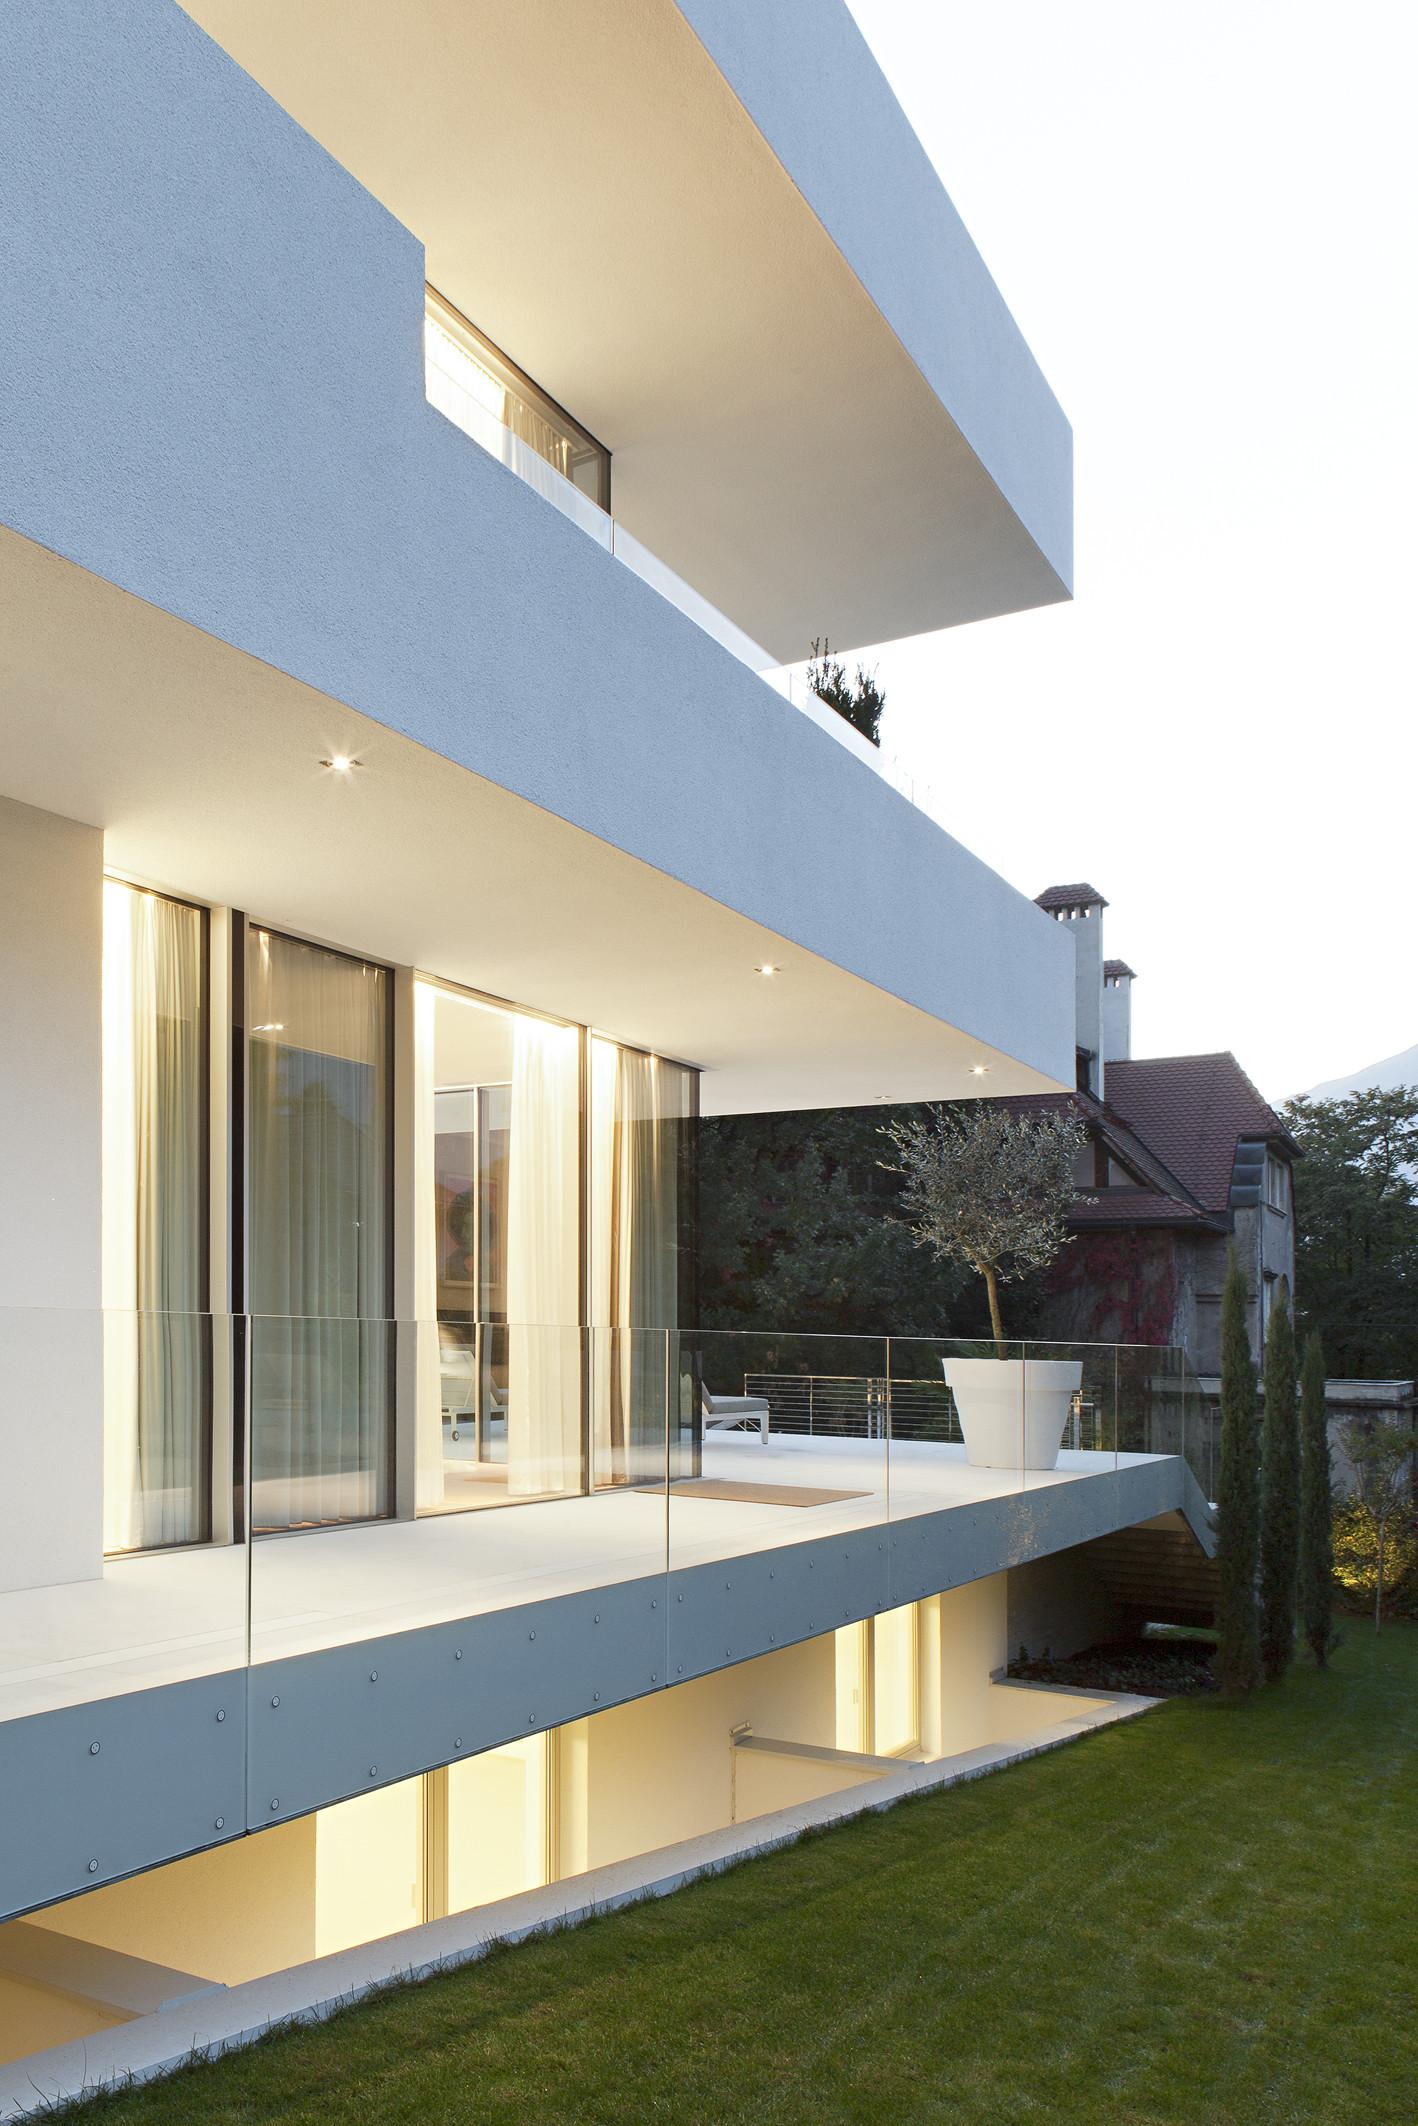 Galer a de casa m monovolume architecture design 10 for Kuchenzeile 3 40 m